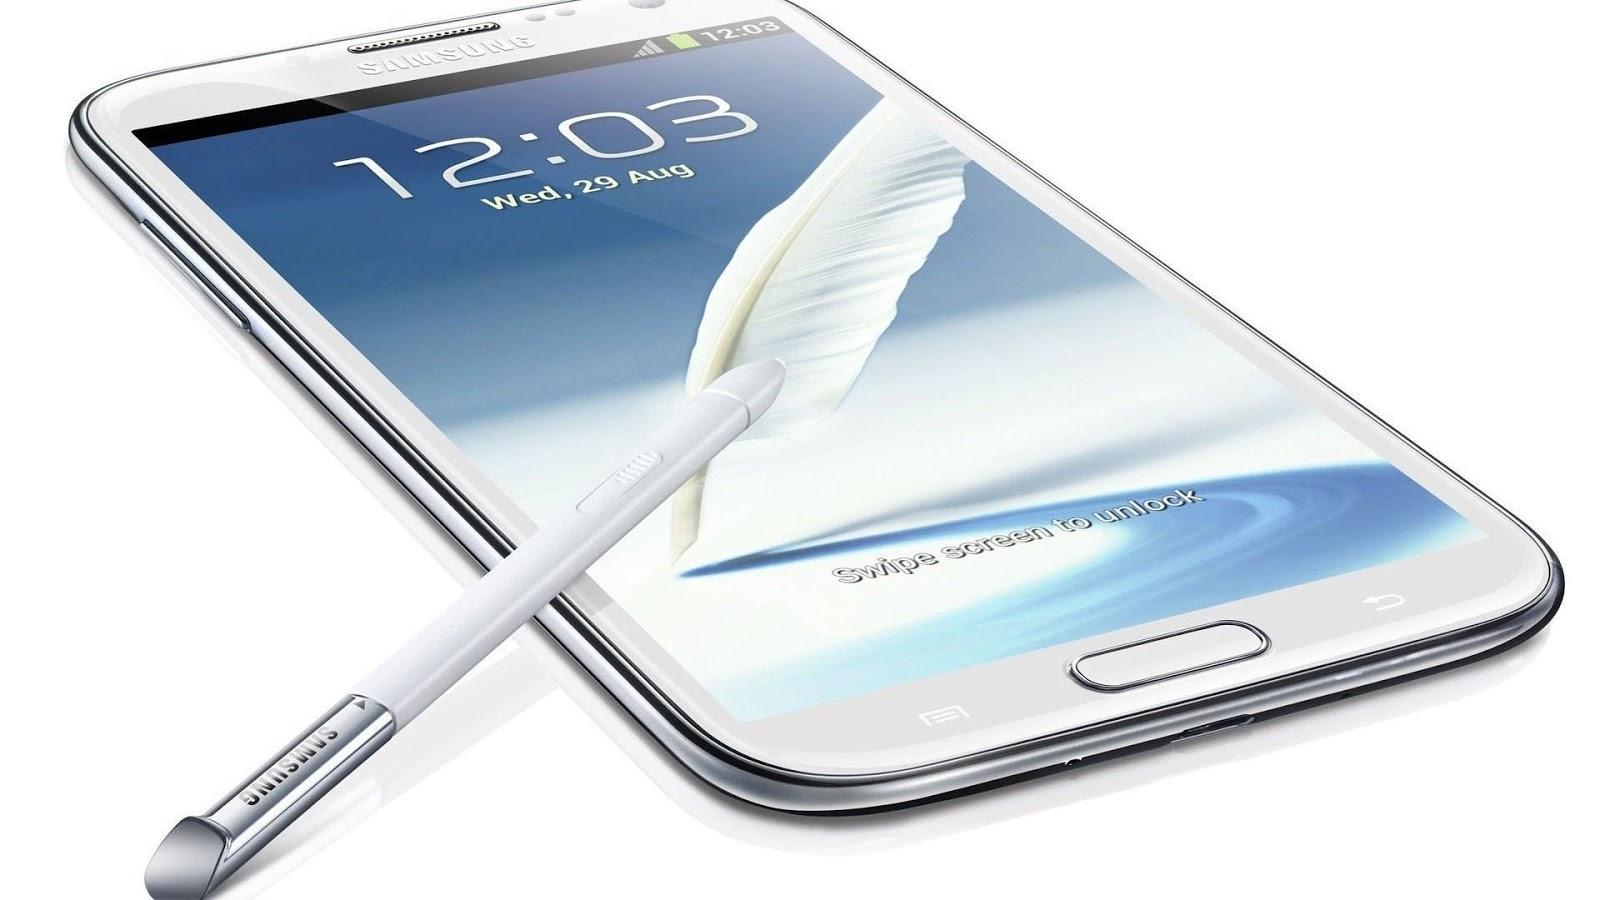 http://2.bp.blogspot.com/-2M3jKQAqSpU/UInuOduv1JI/AAAAAAAAEPw/74inw0yCNj8/s1600/Samsung+Galaxy+S3.jpg